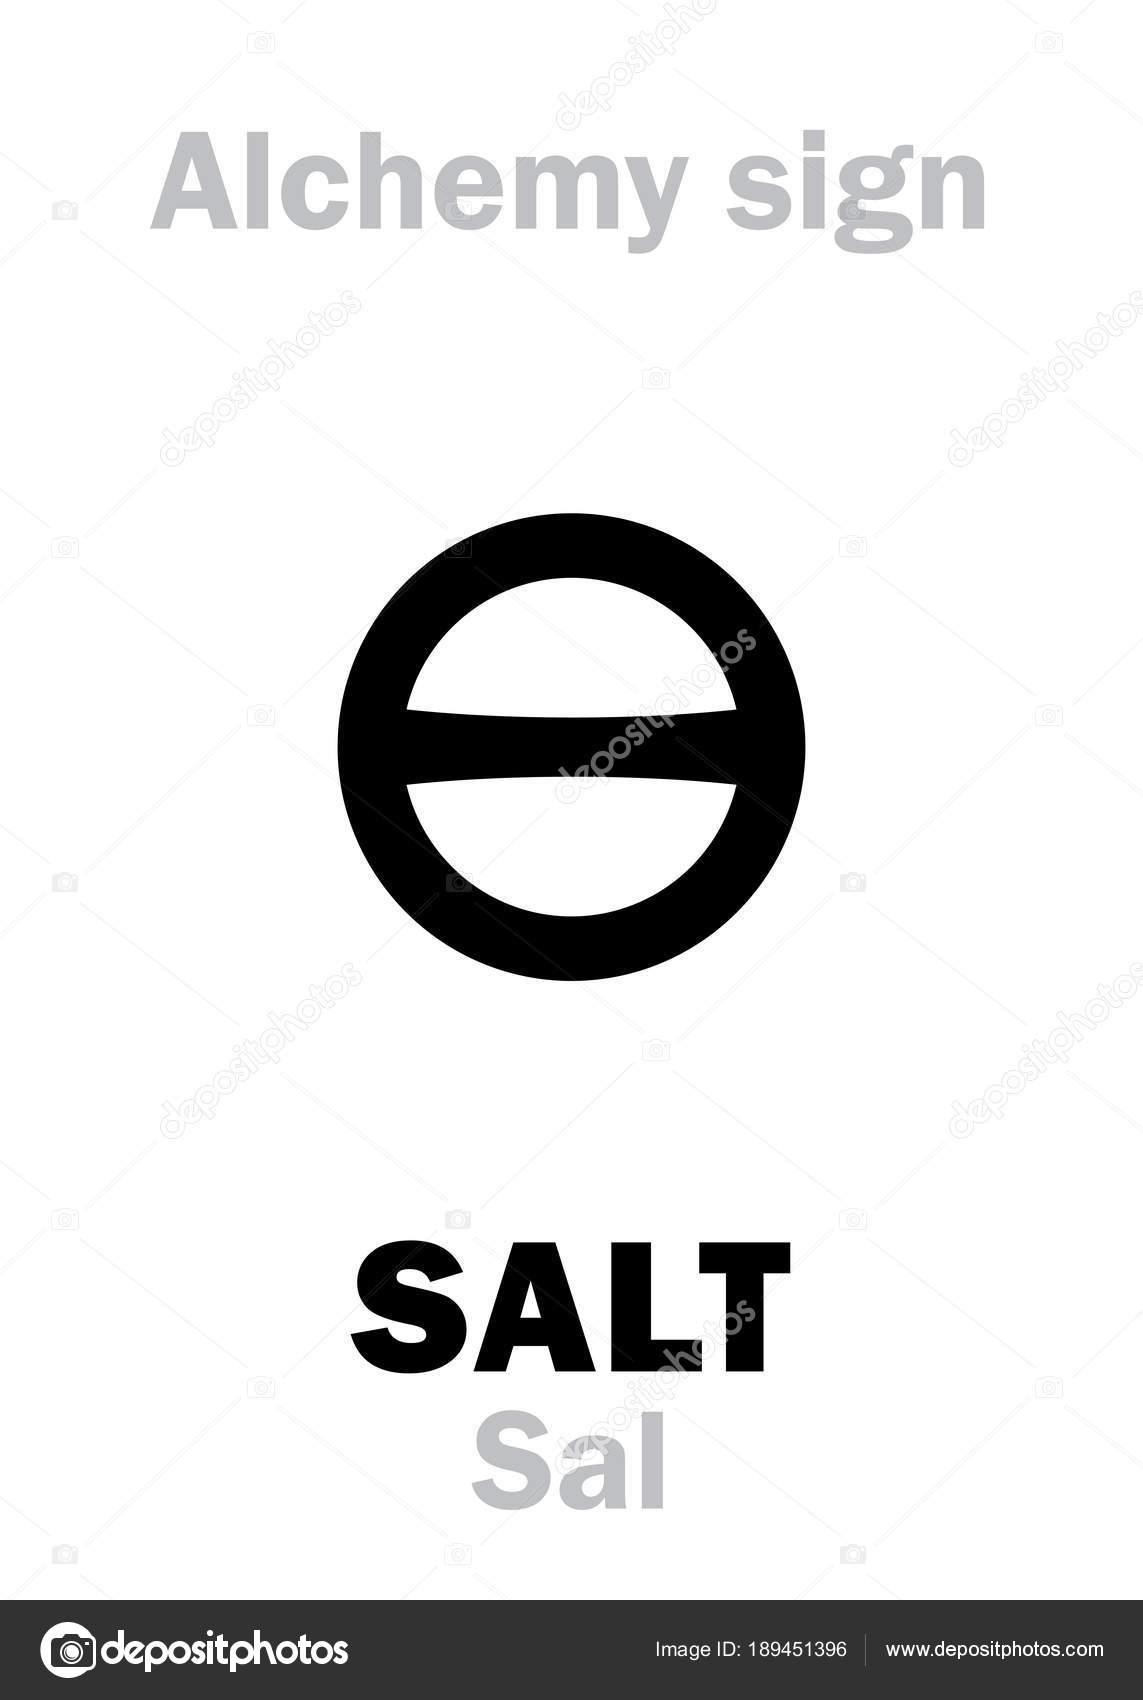 Alchemy Salt Sal Photon 189451396